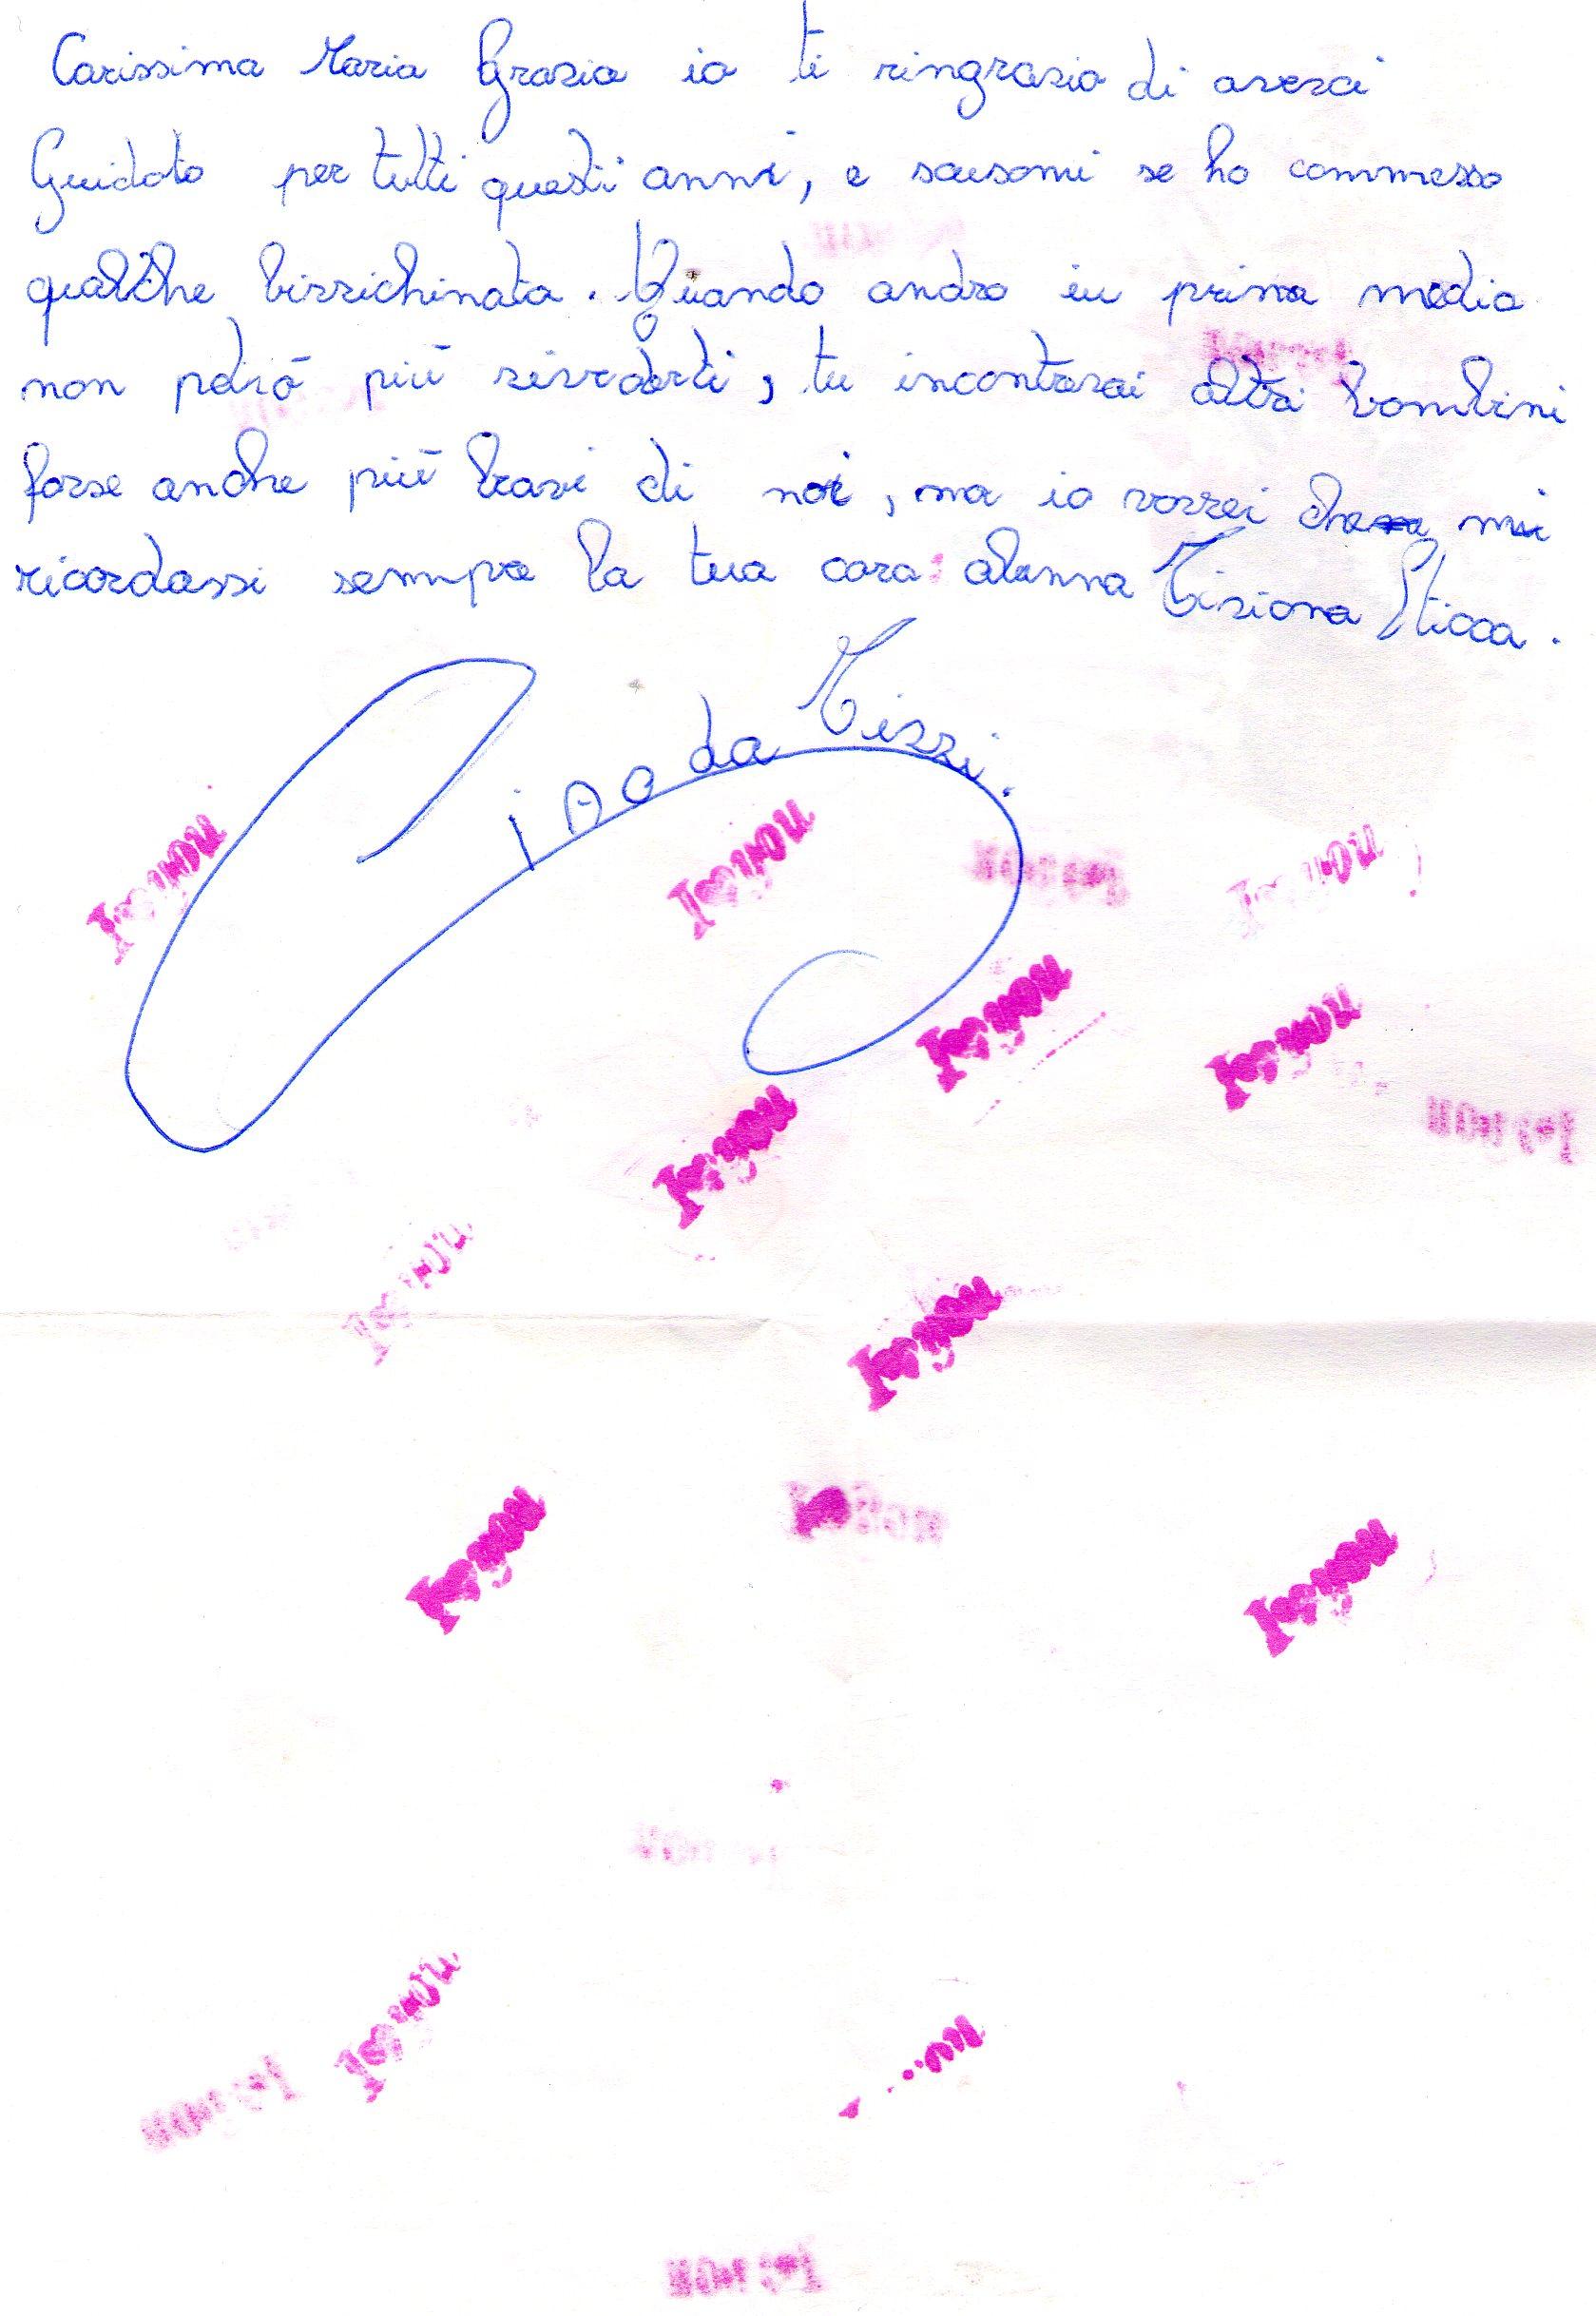 lettera di Tiziana Sticca 1985